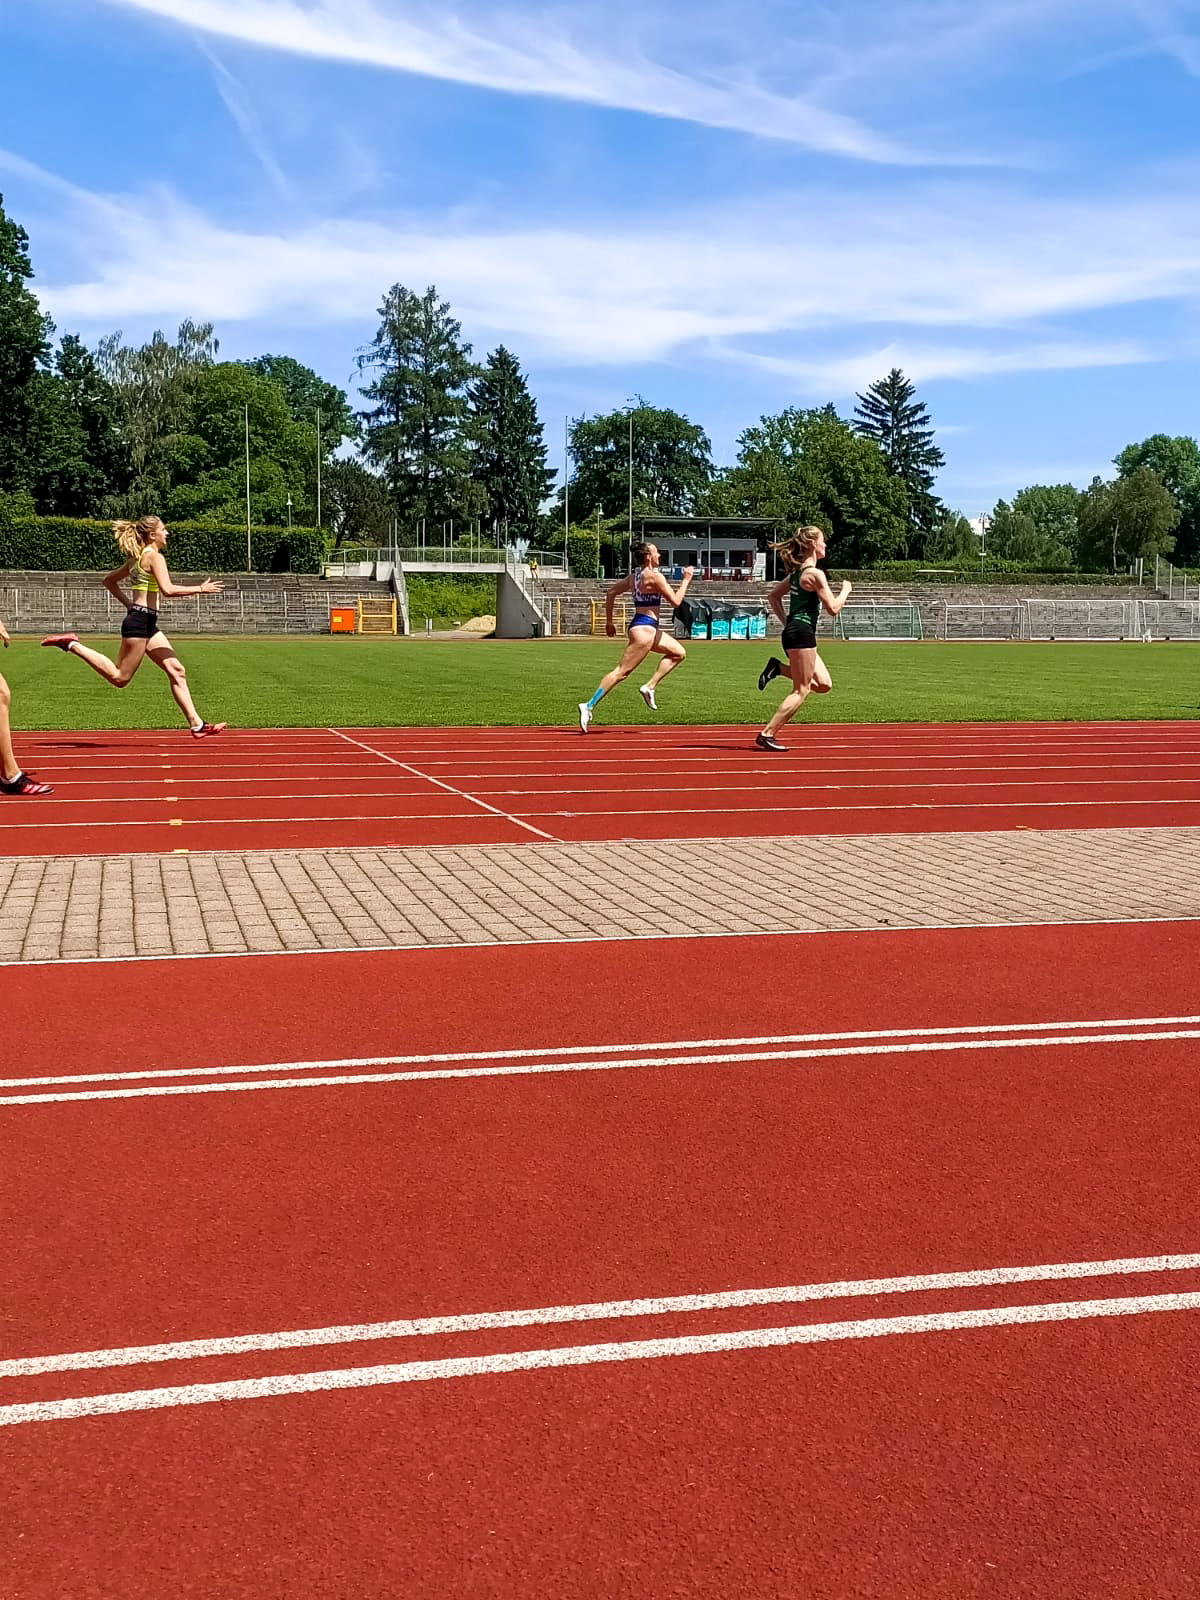 100m - Lena - Foto: privat